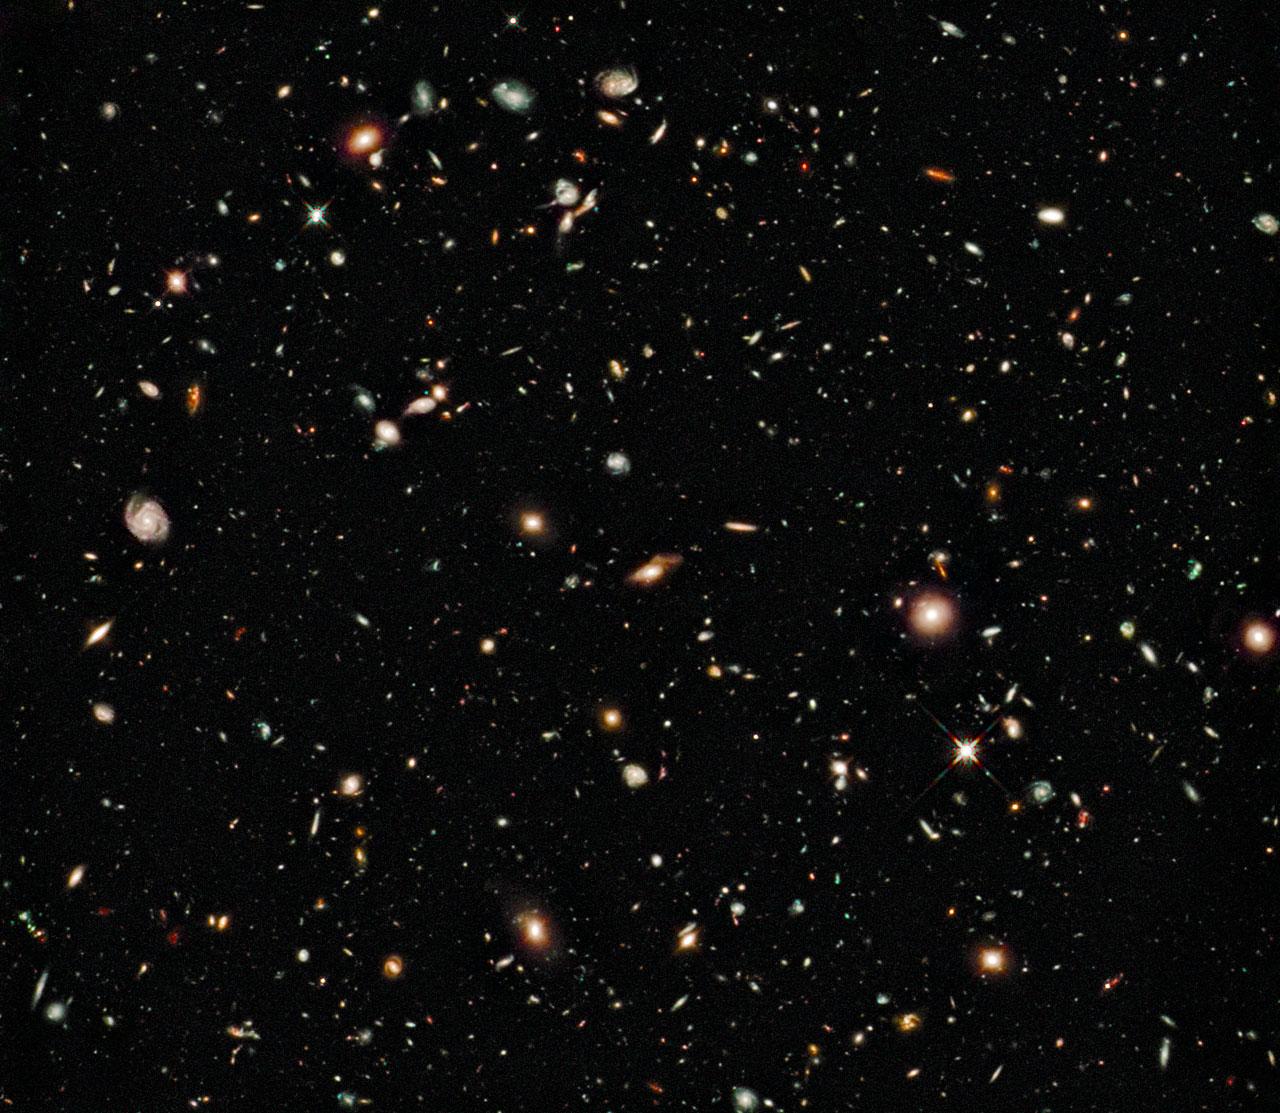 Hubble Ultra Deep Field - Infrared (2009)